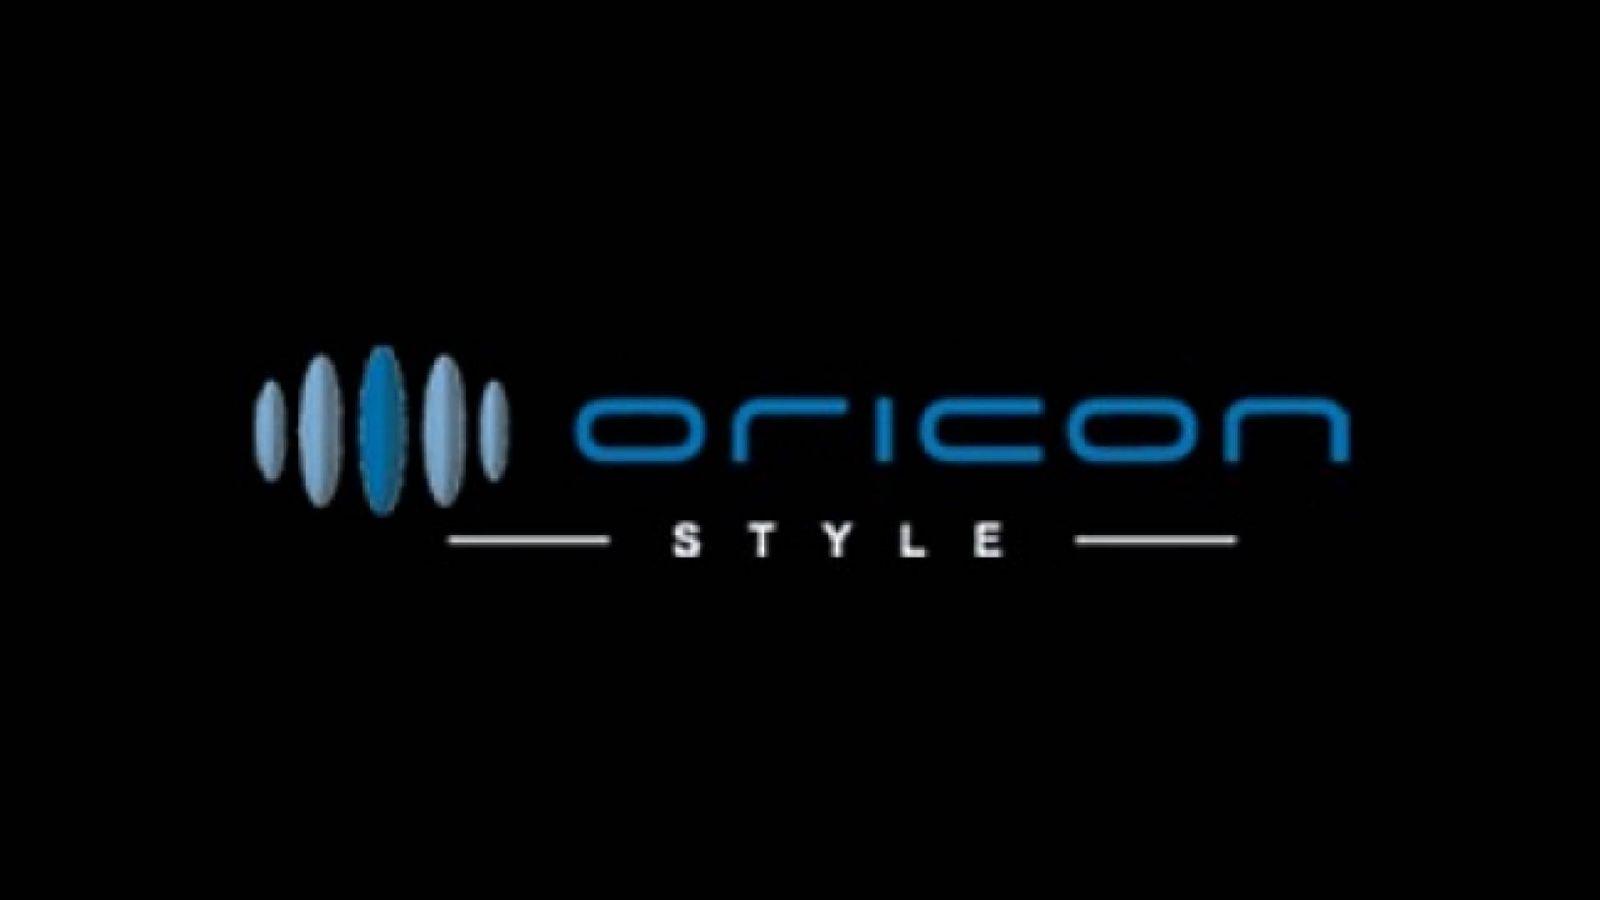 Top Oricon n°5 © JaME - Oricon